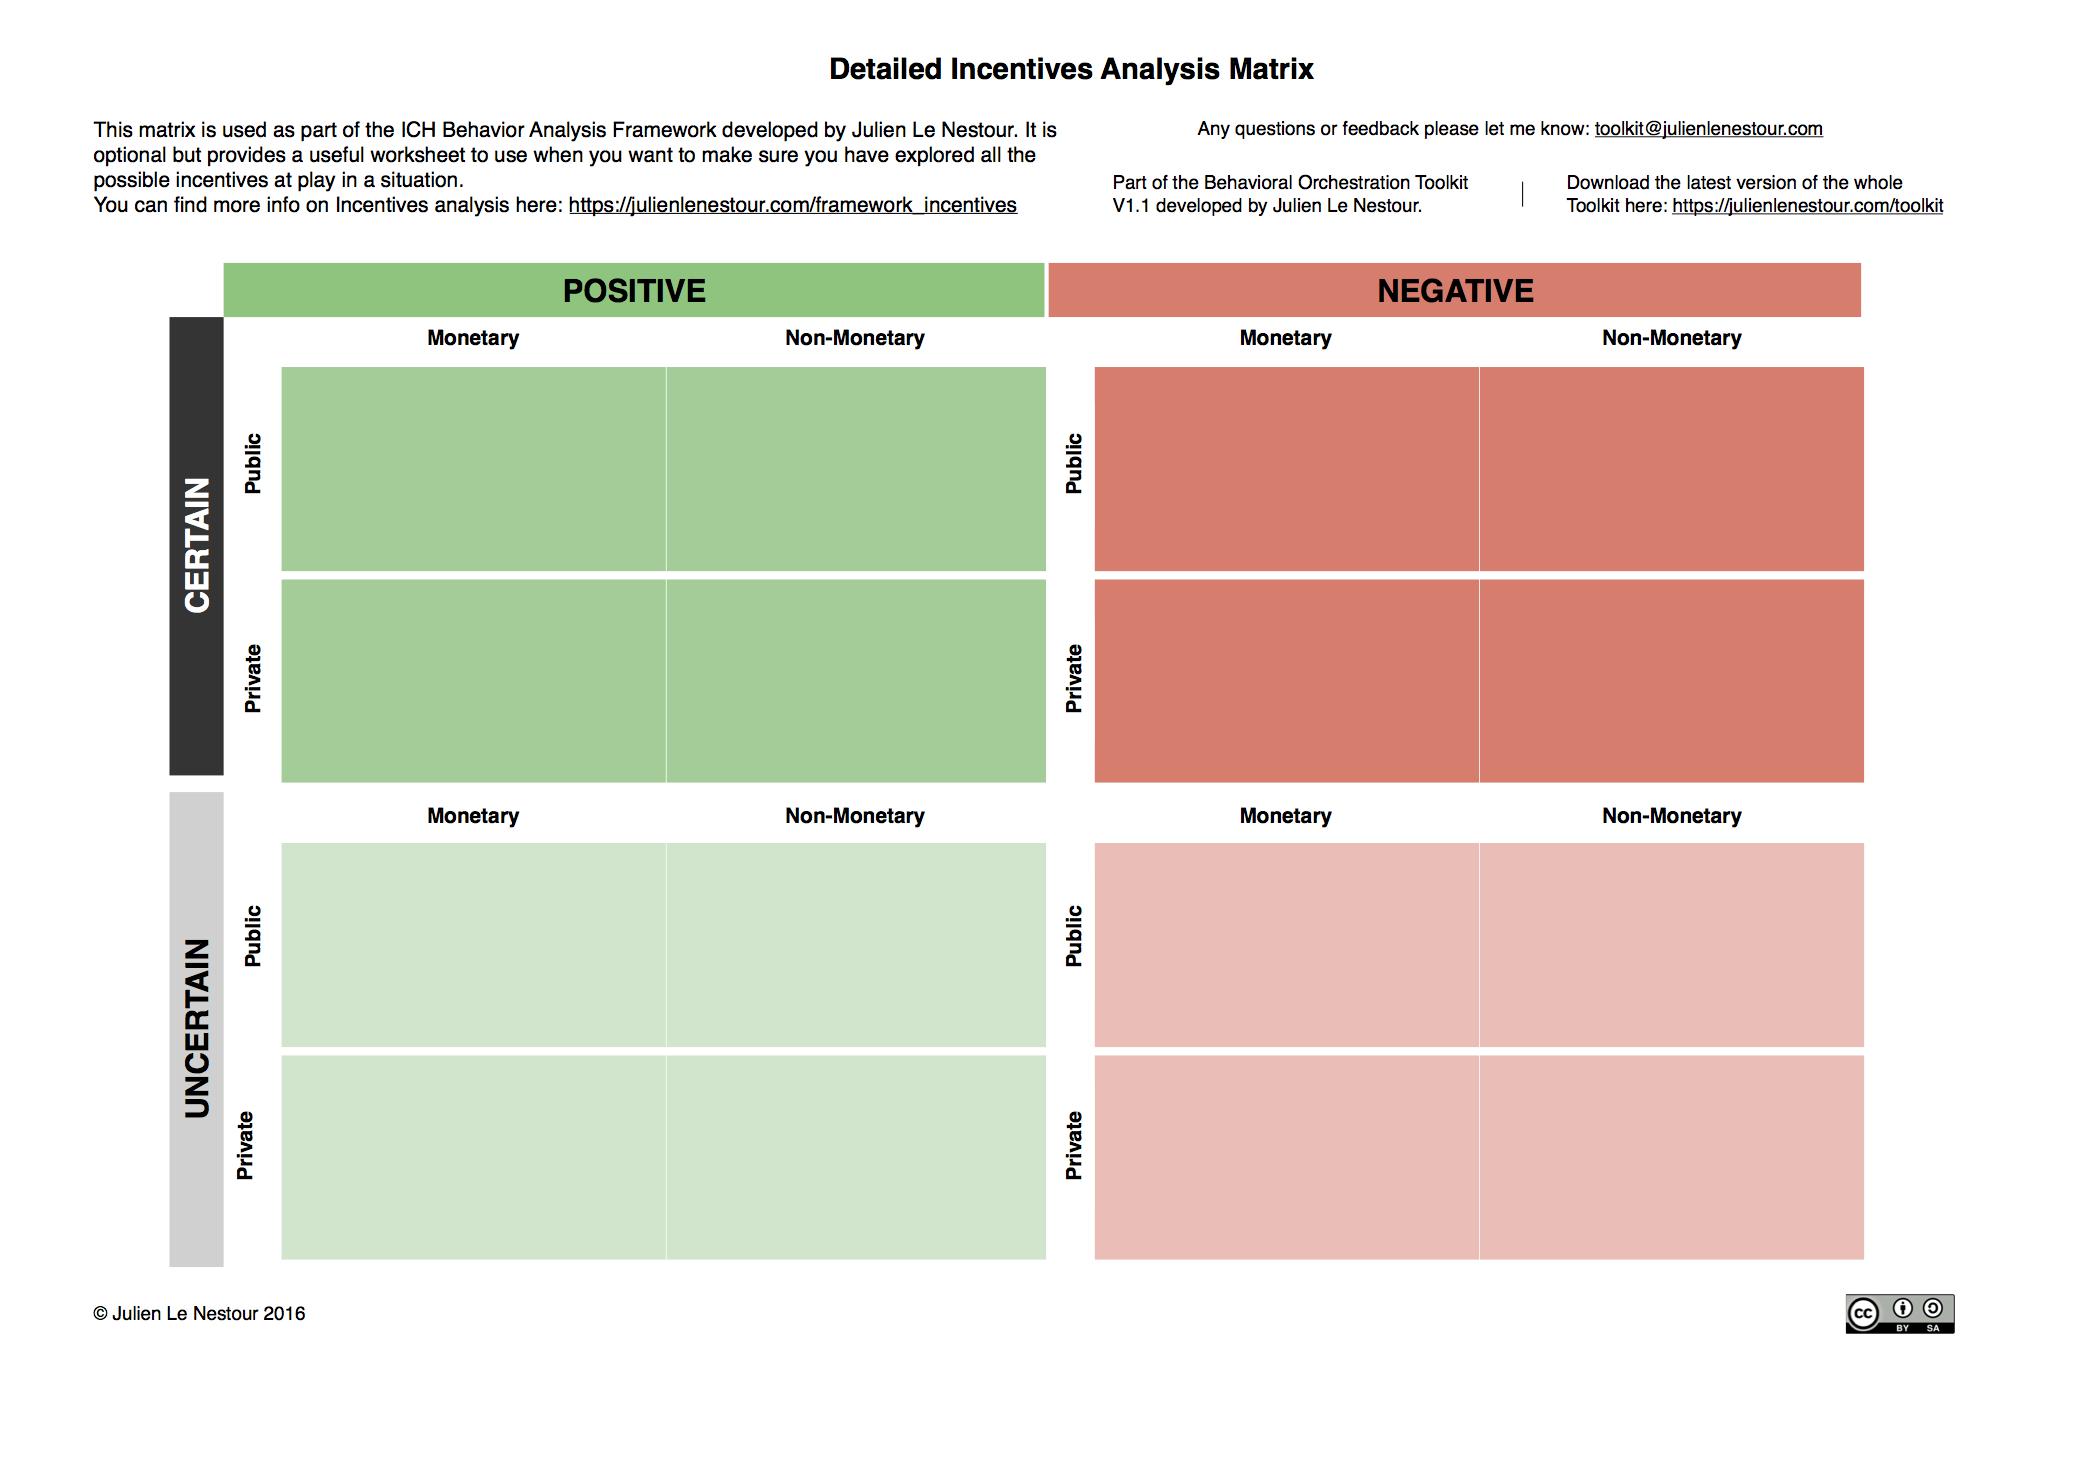 icar behavior analysis framework julien le nestour detailed incentives analysis matrix picture